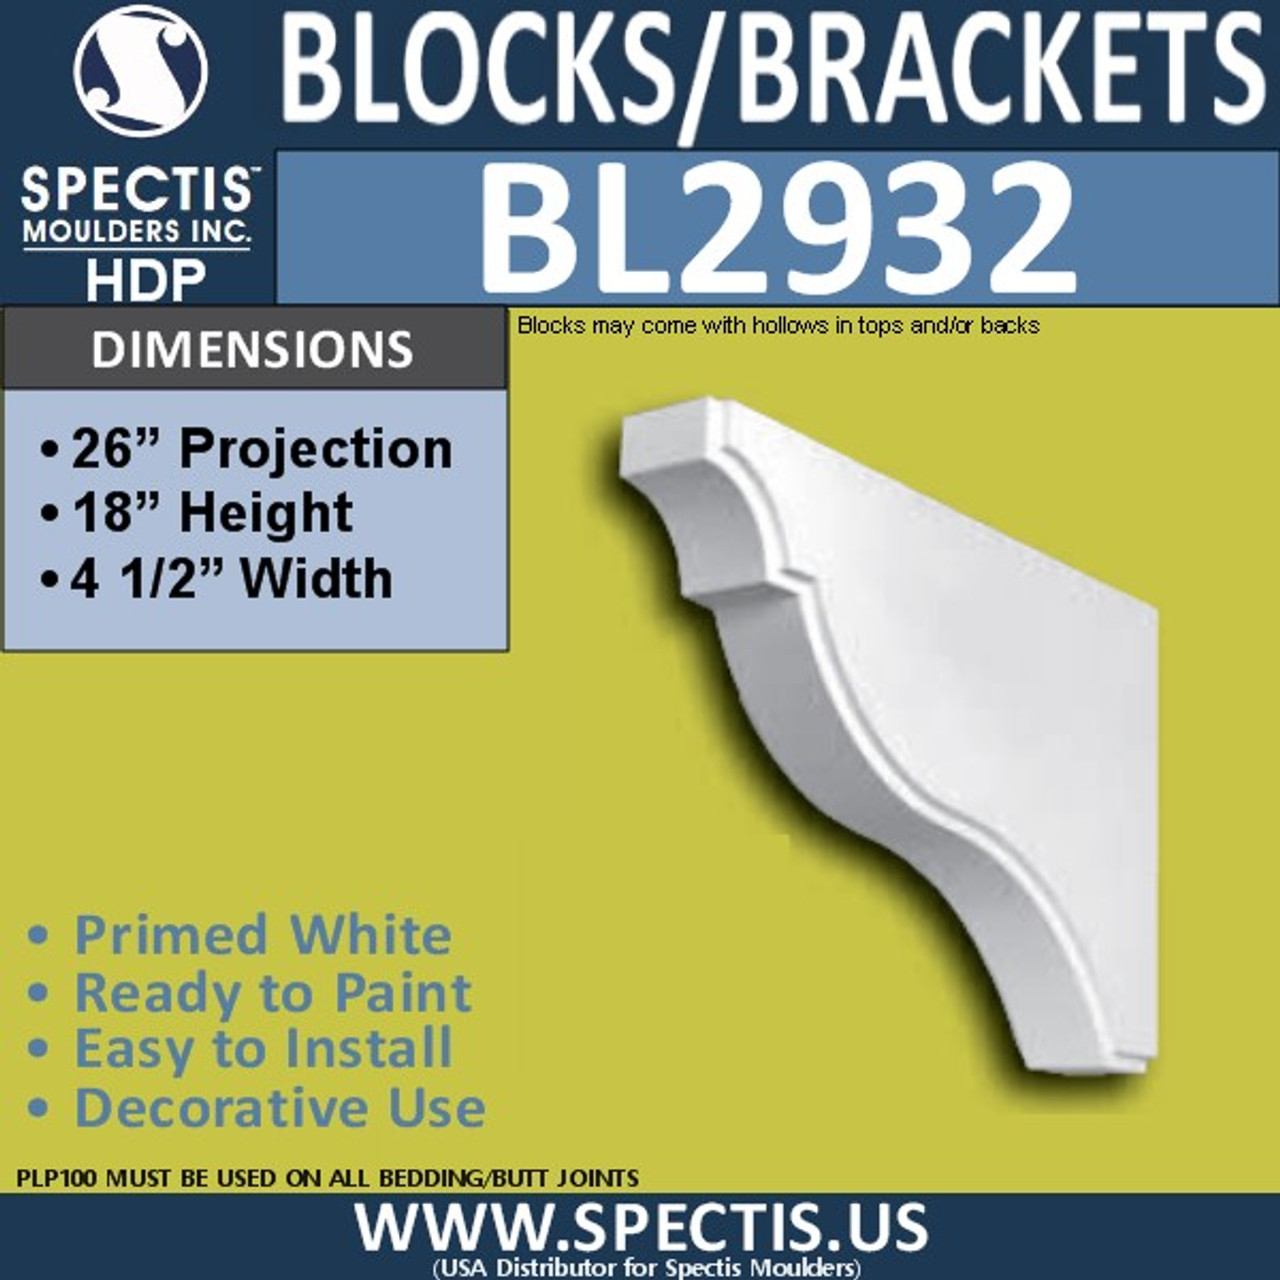 "BL2932 Eave Block or Bracket 4.5""W x 26""H x 18"" P"